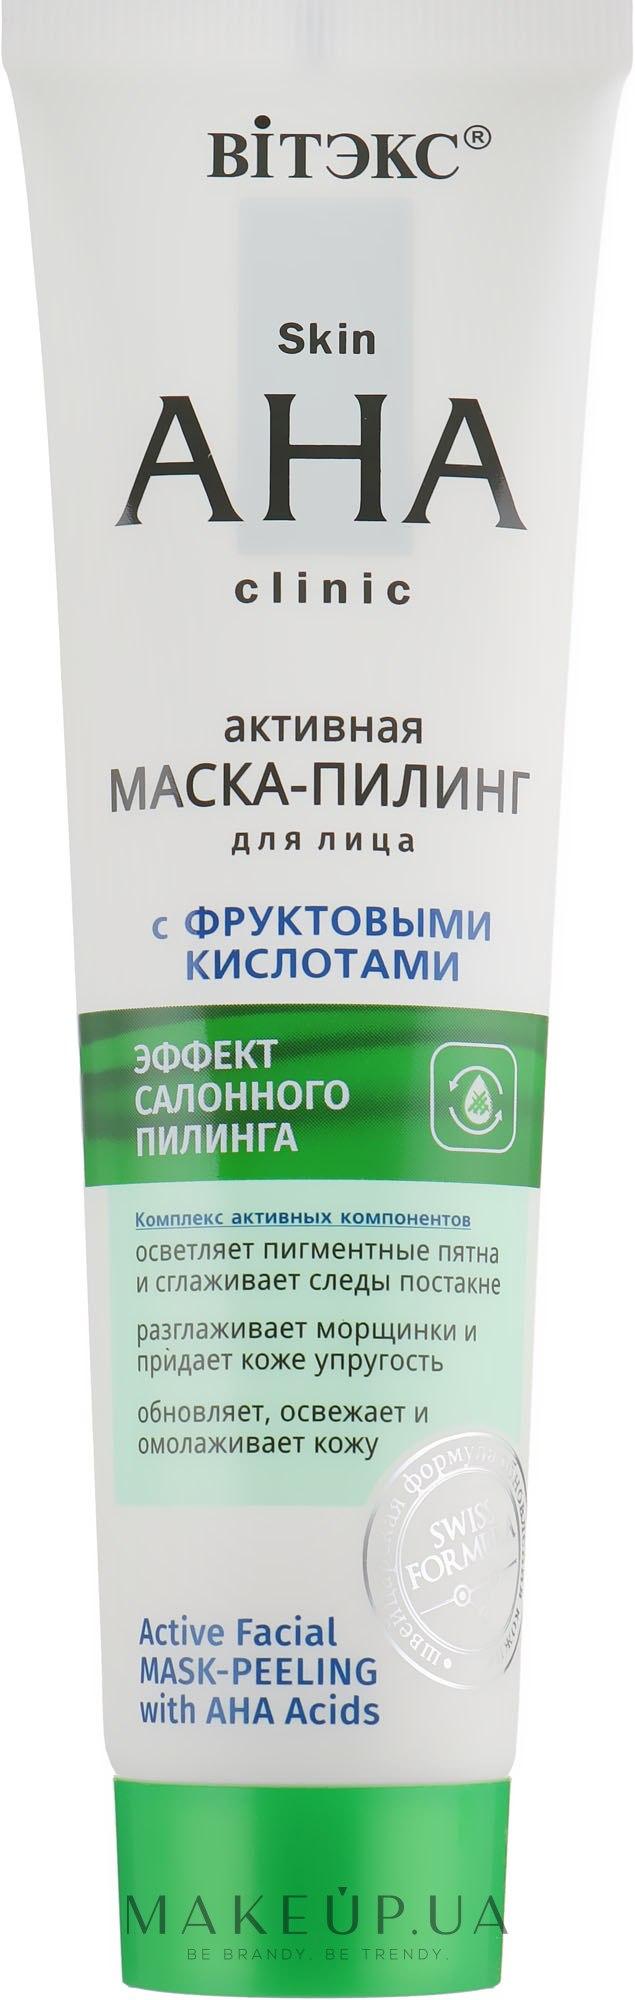 Маска-пилинг для лица с фруктовыми кислотами - Витэкс Skin AHA Clinic Active Facial Mask-Peeling — фото 100ml